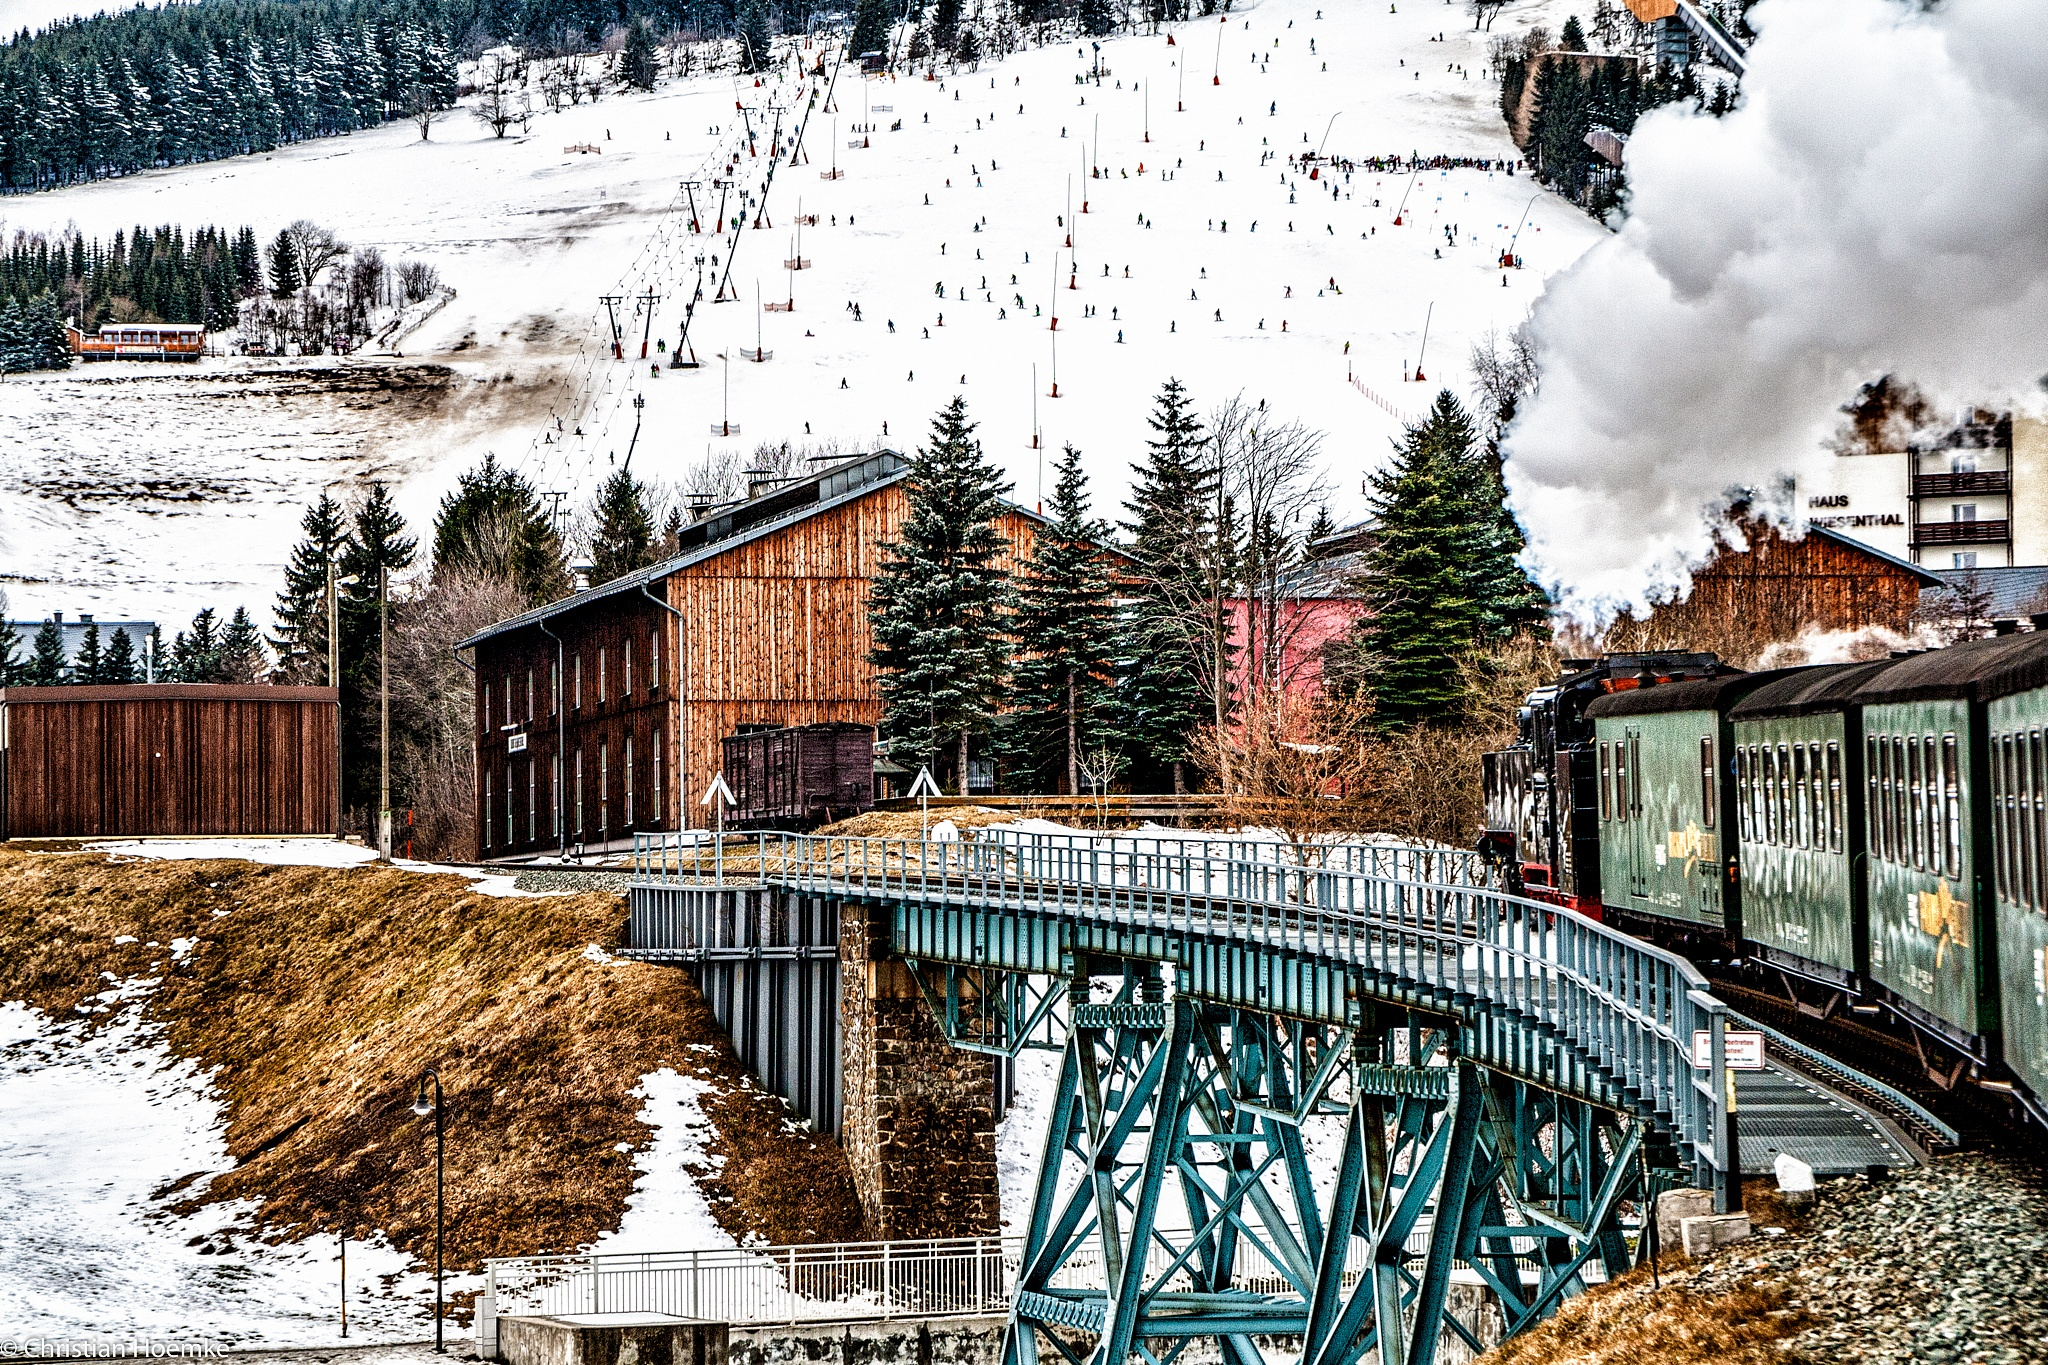 20140209 Ausflug zum Fichtelberg-23 by Christian Hoemke